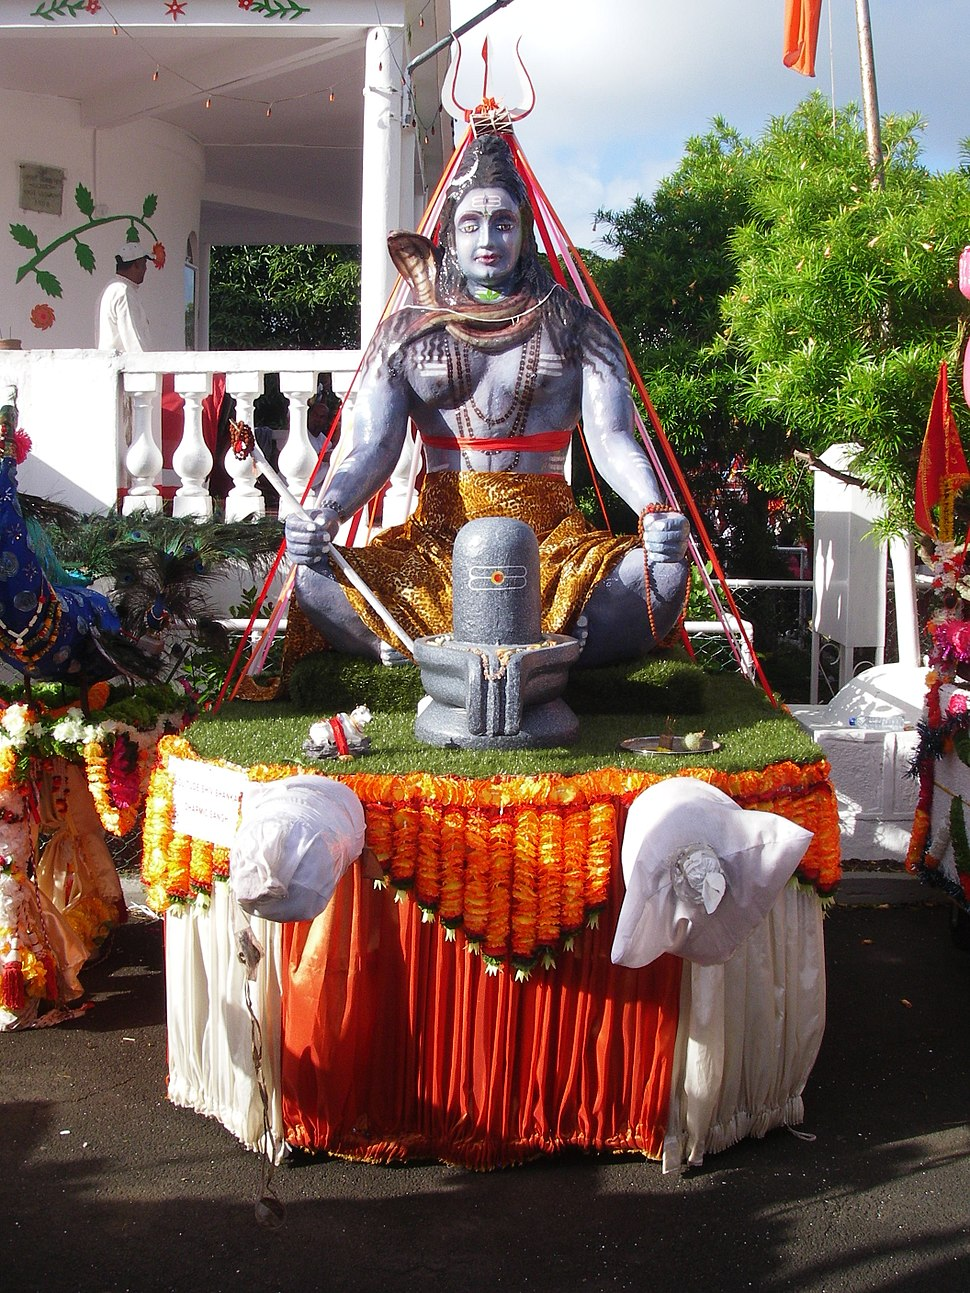 02 Mahashivratree festival